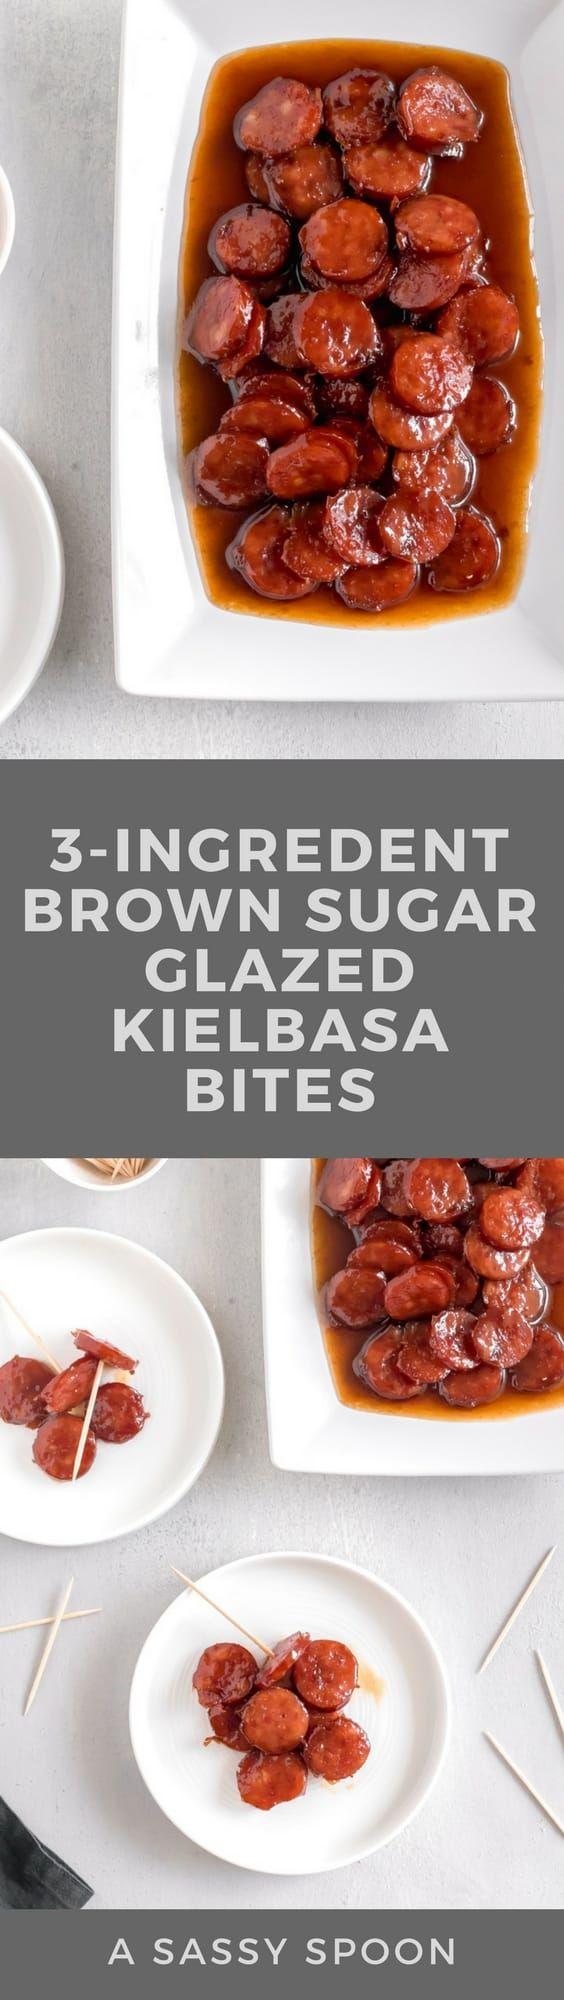 3-ingredient Brown Sugar Glazed Kielbasa Bites A Sassy Spoon